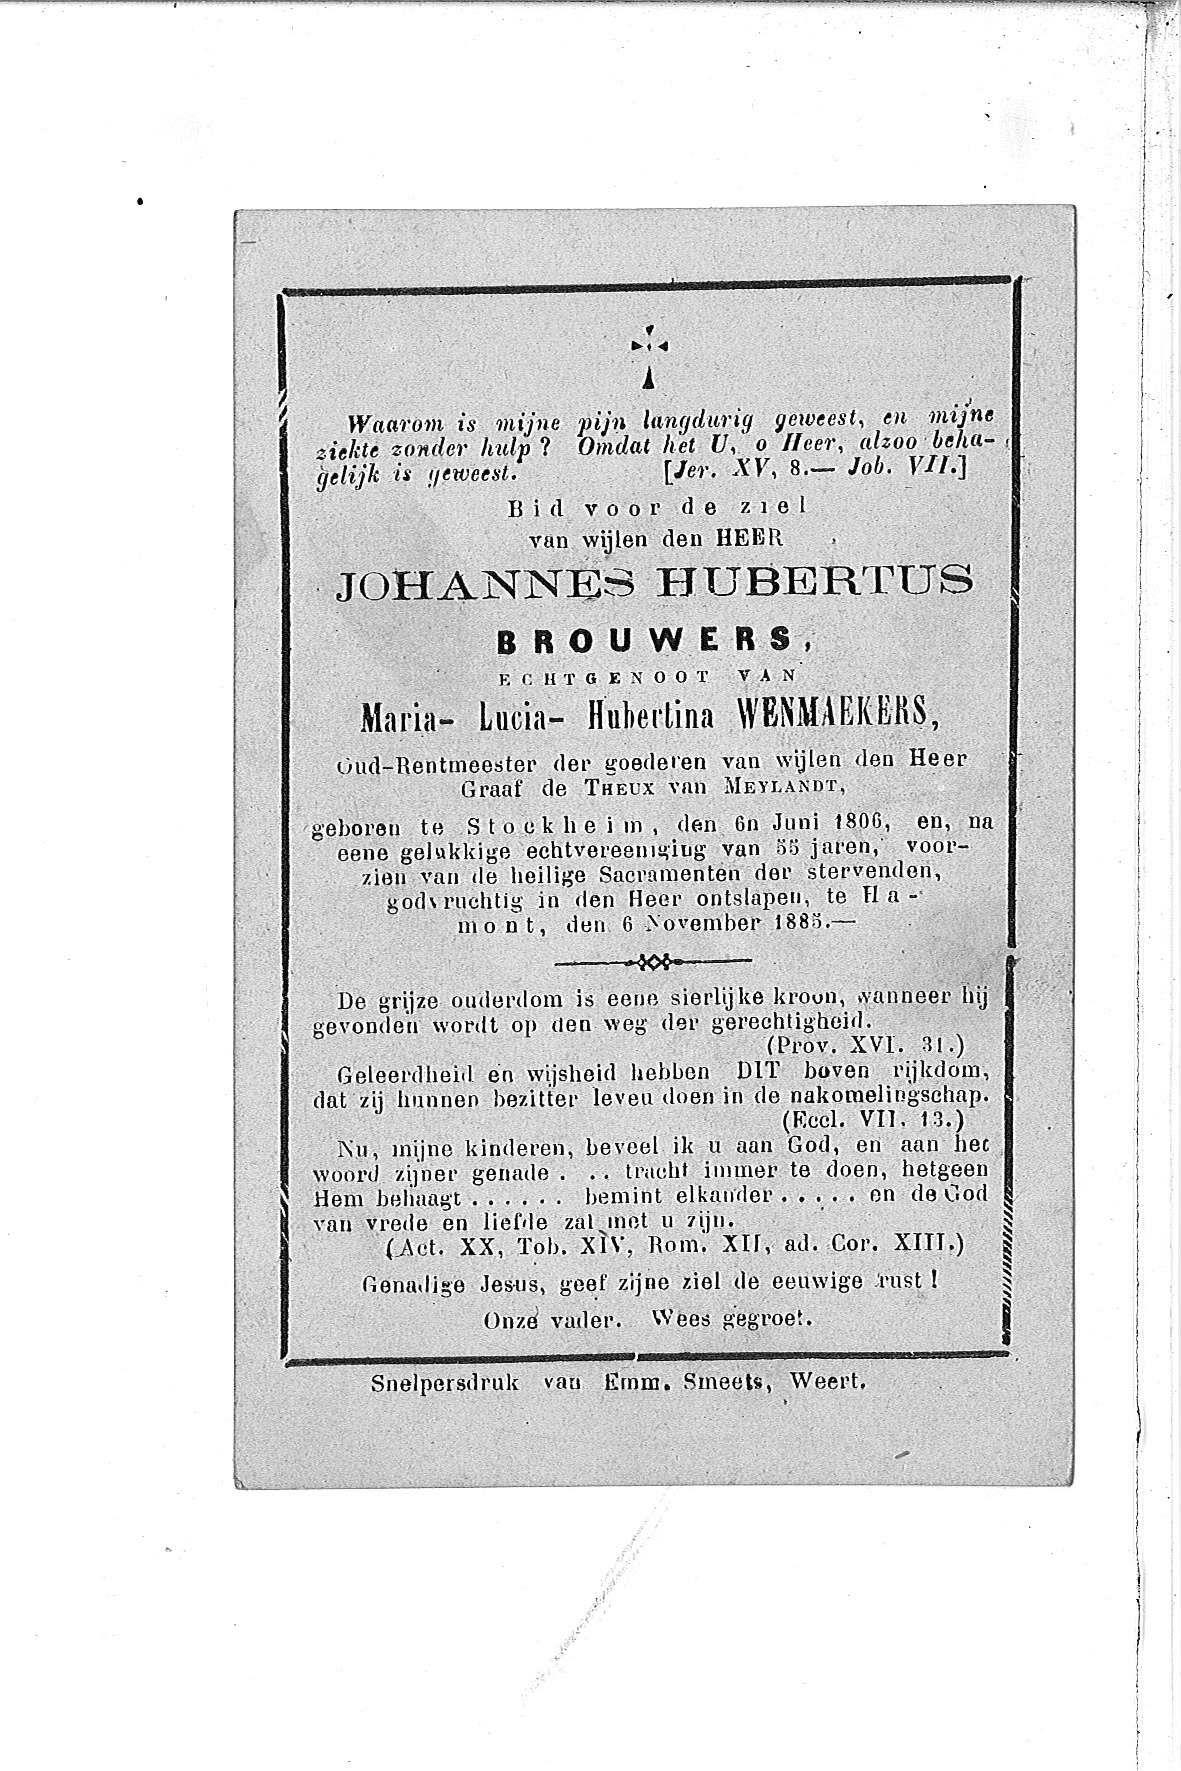 johannes-hubertus(1886)20100715084622_00073.jpg